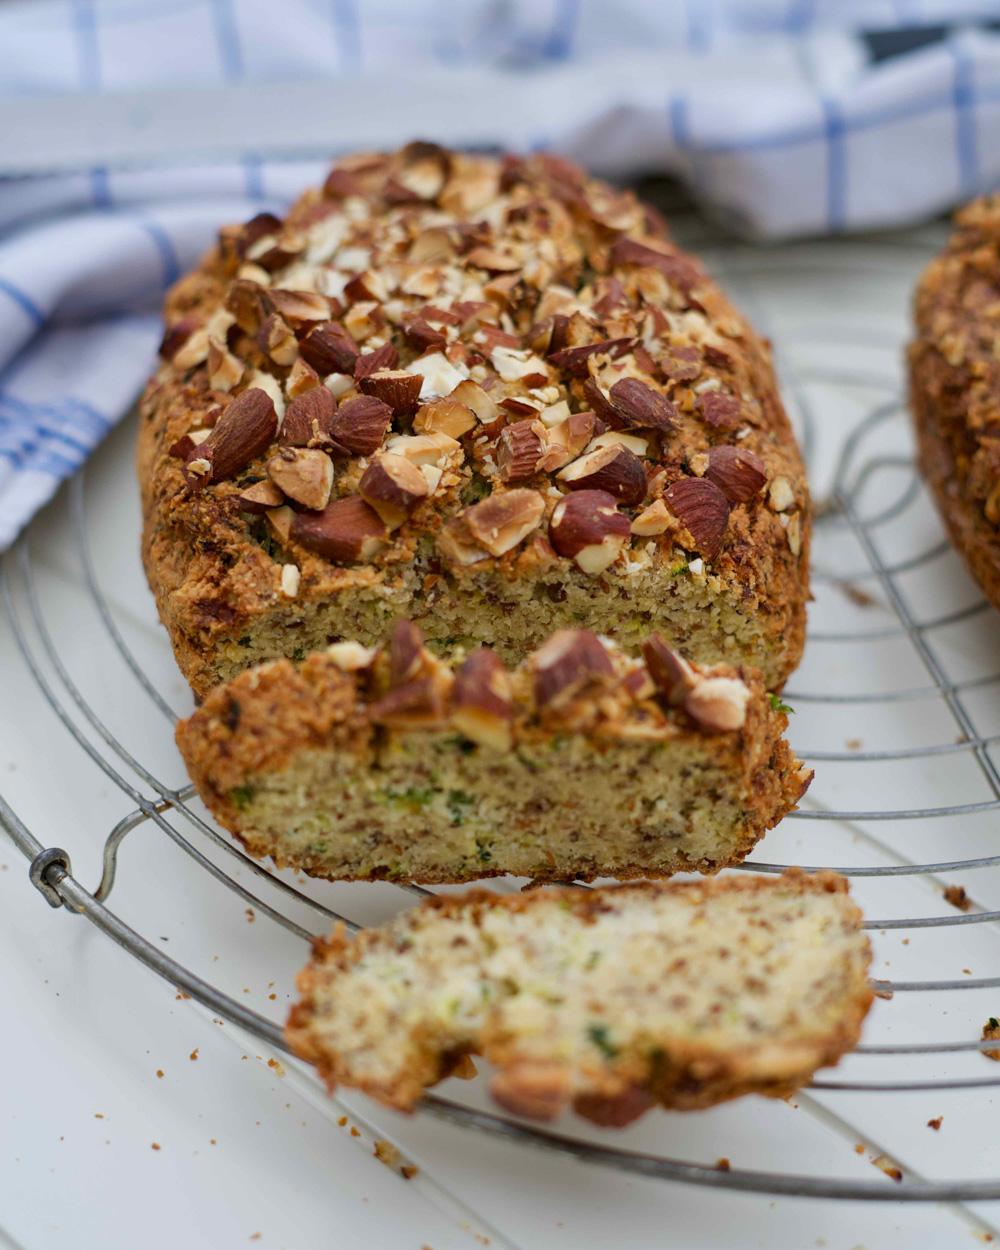 Katrin-Fernwehkueche-Saftiges-Zucchini-Brot